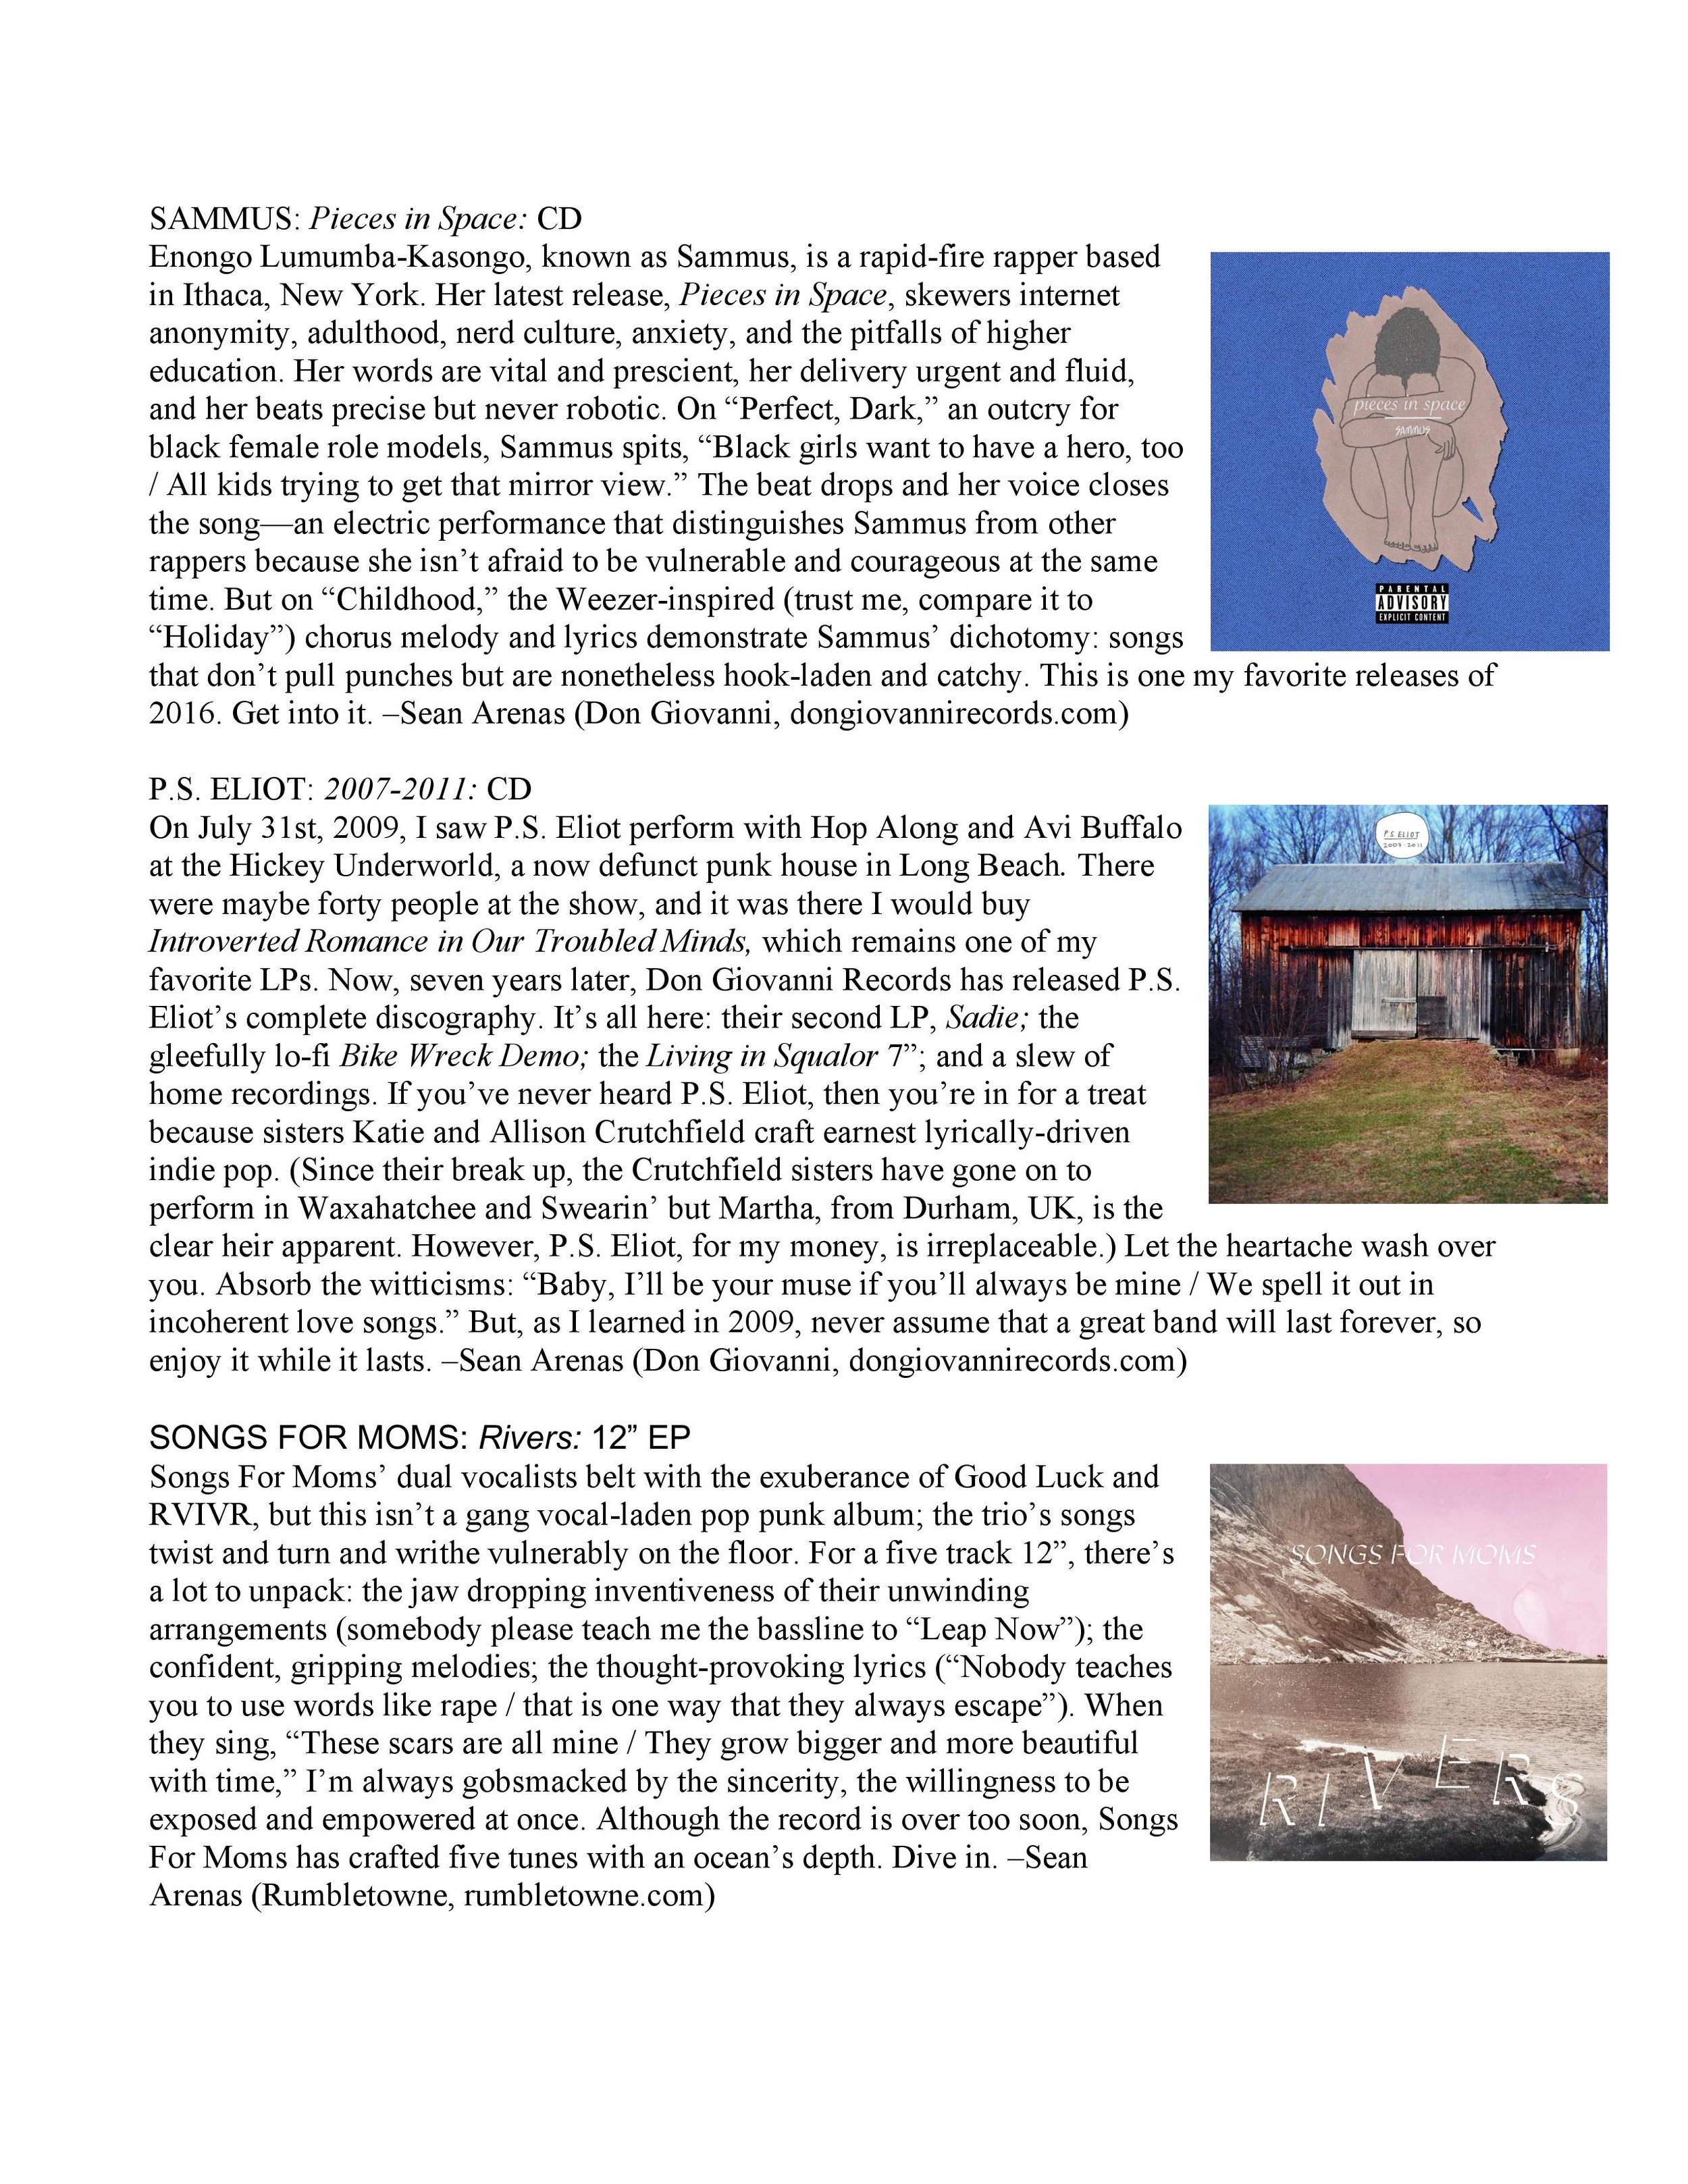 SEAN ARENAS_RECORD REV WRITING SAMPLES-page-002.jpg